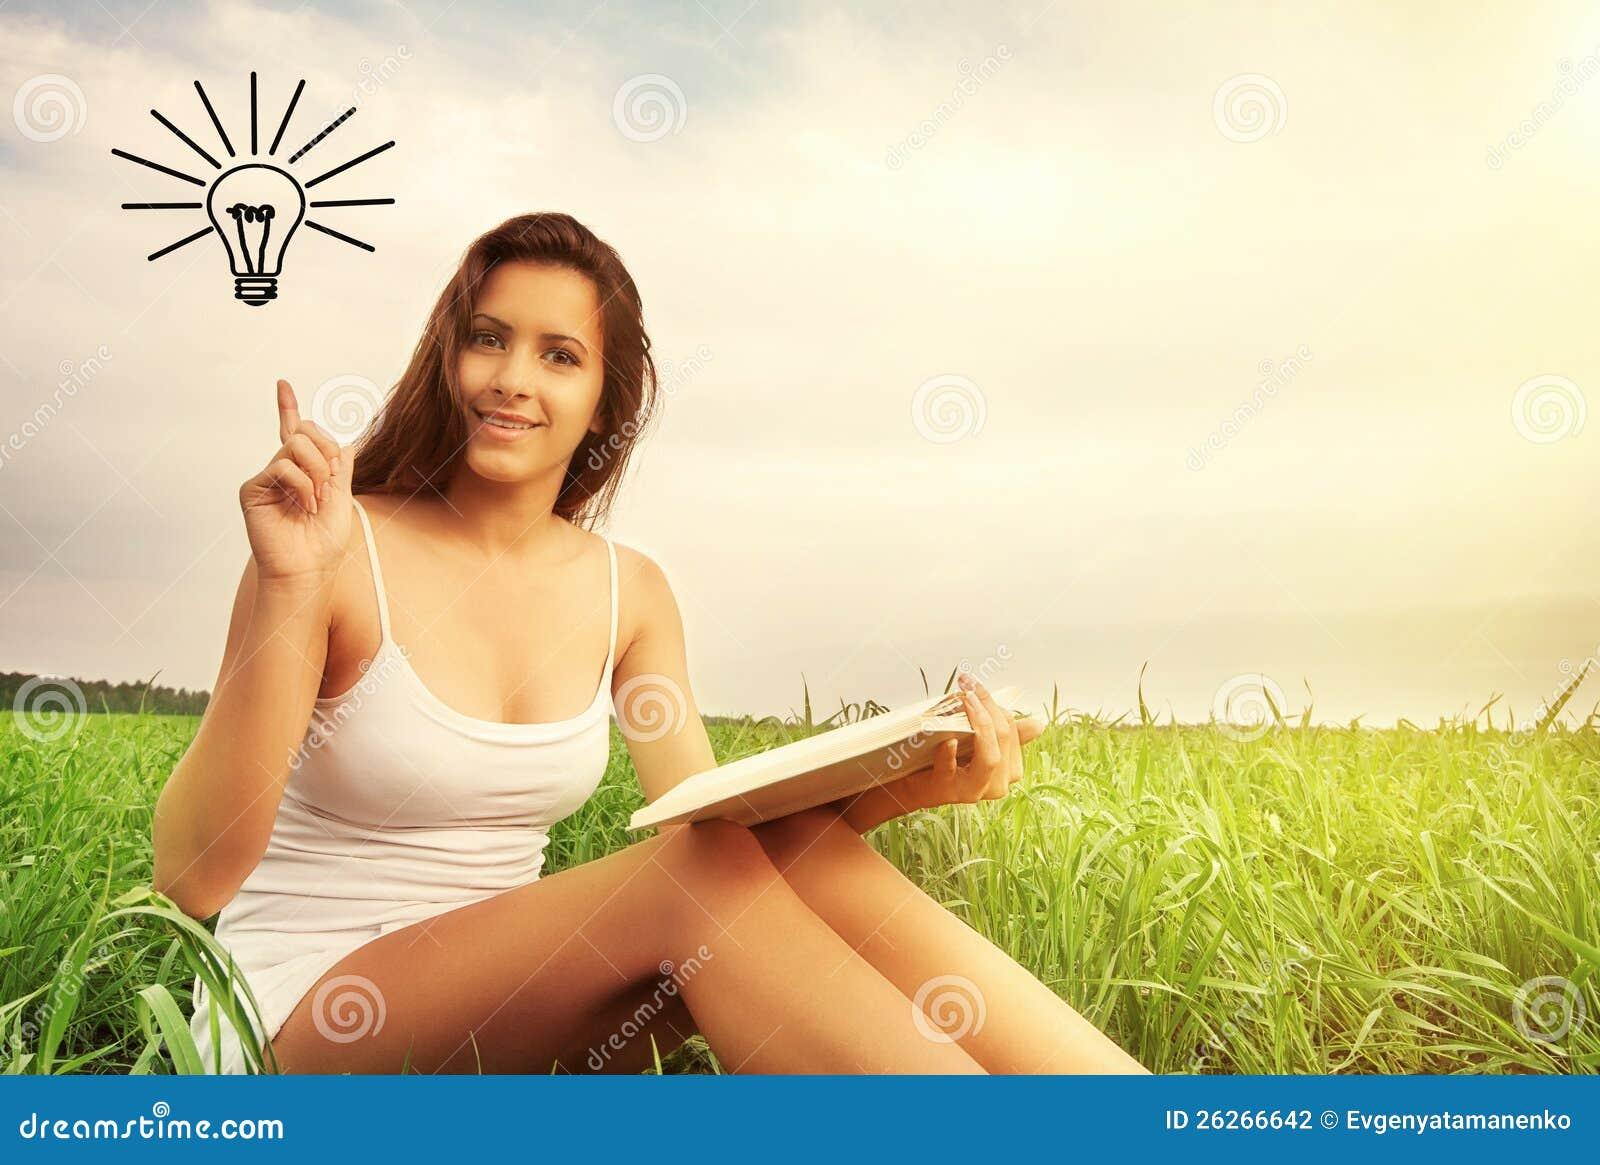 Concepto de educación. muchacha que lee un libro